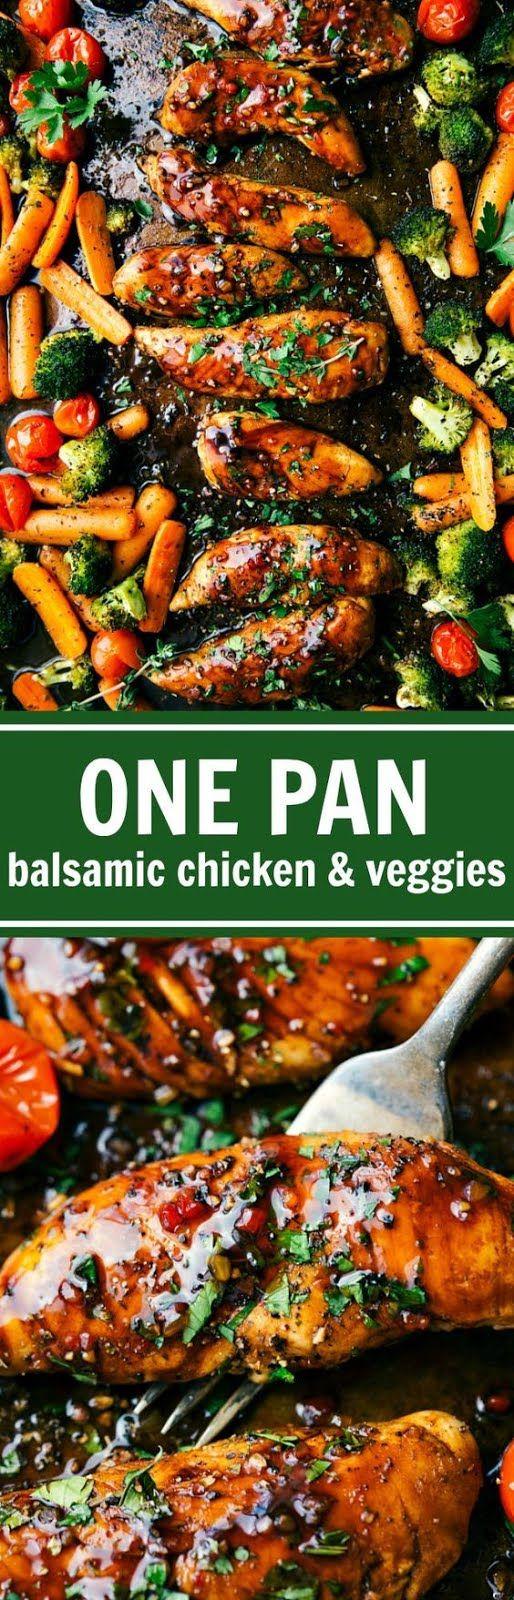 One pan balsamic chicken & veggies - soooo easy!